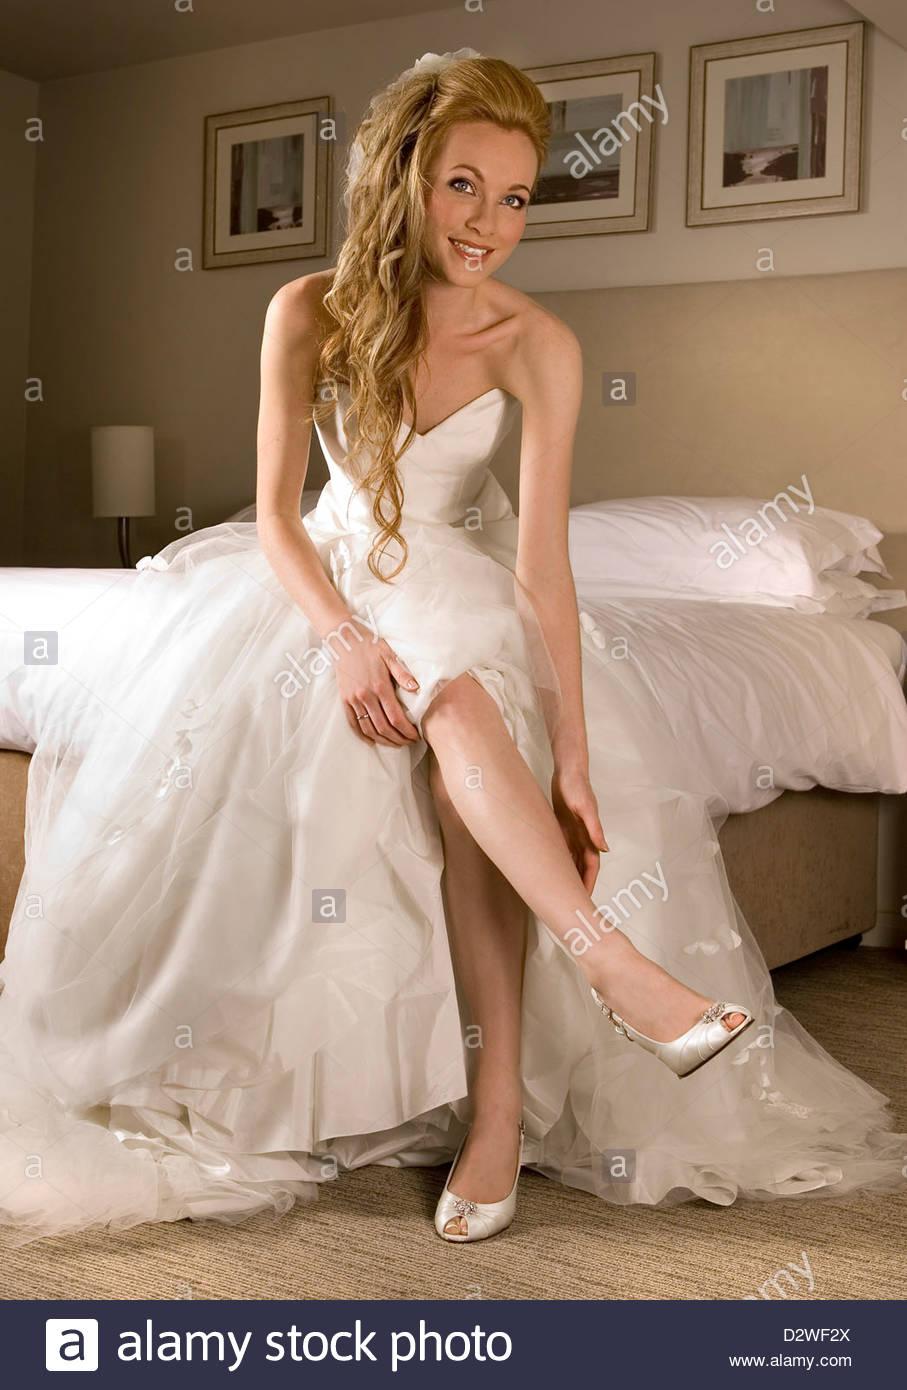 wedding dresses st louis photo - 1